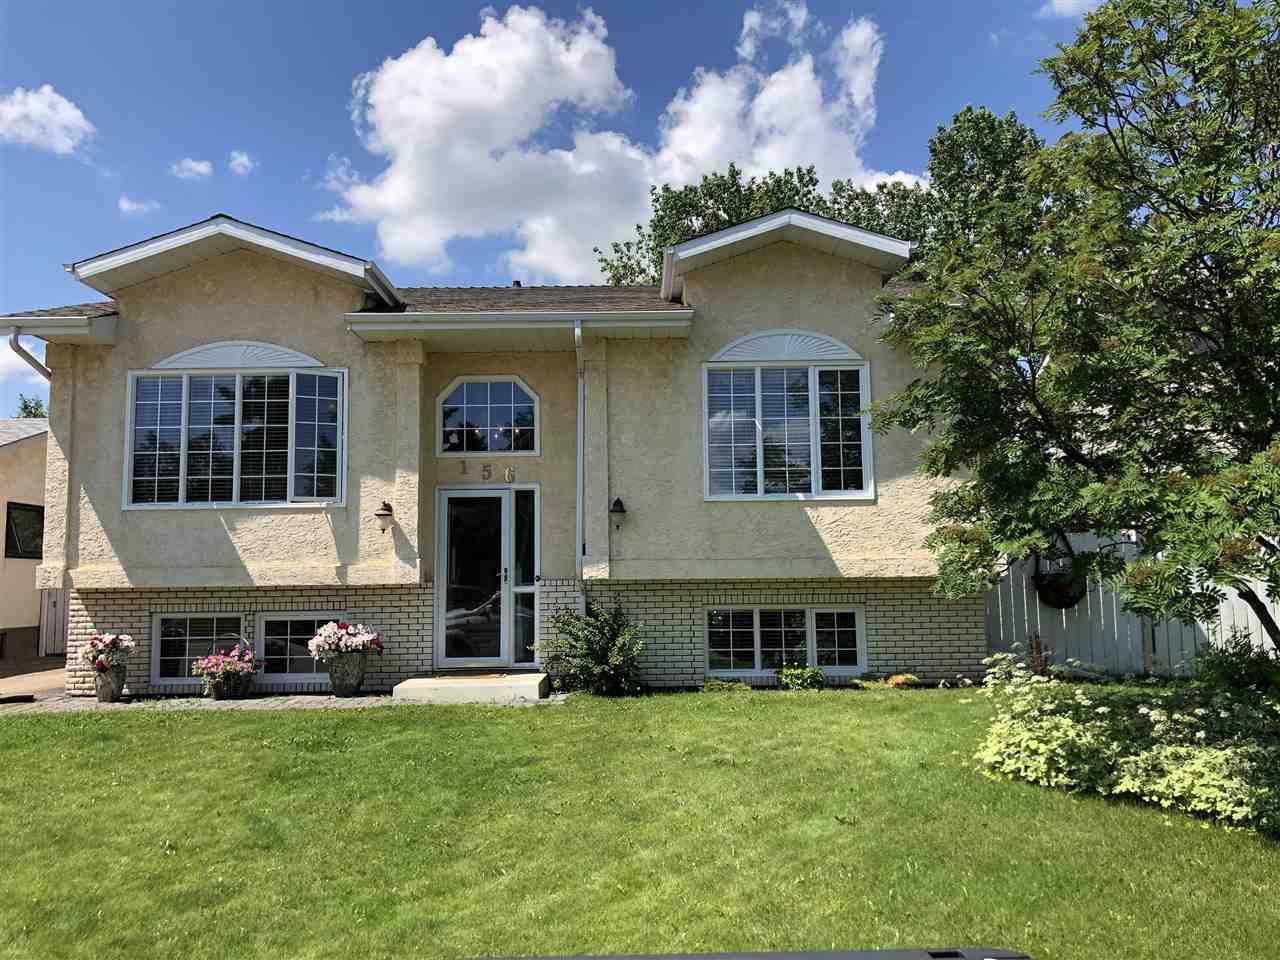 Main Photo: 156 Garwood Crescent: Wetaskiwin House for sale : MLS®# E4204978